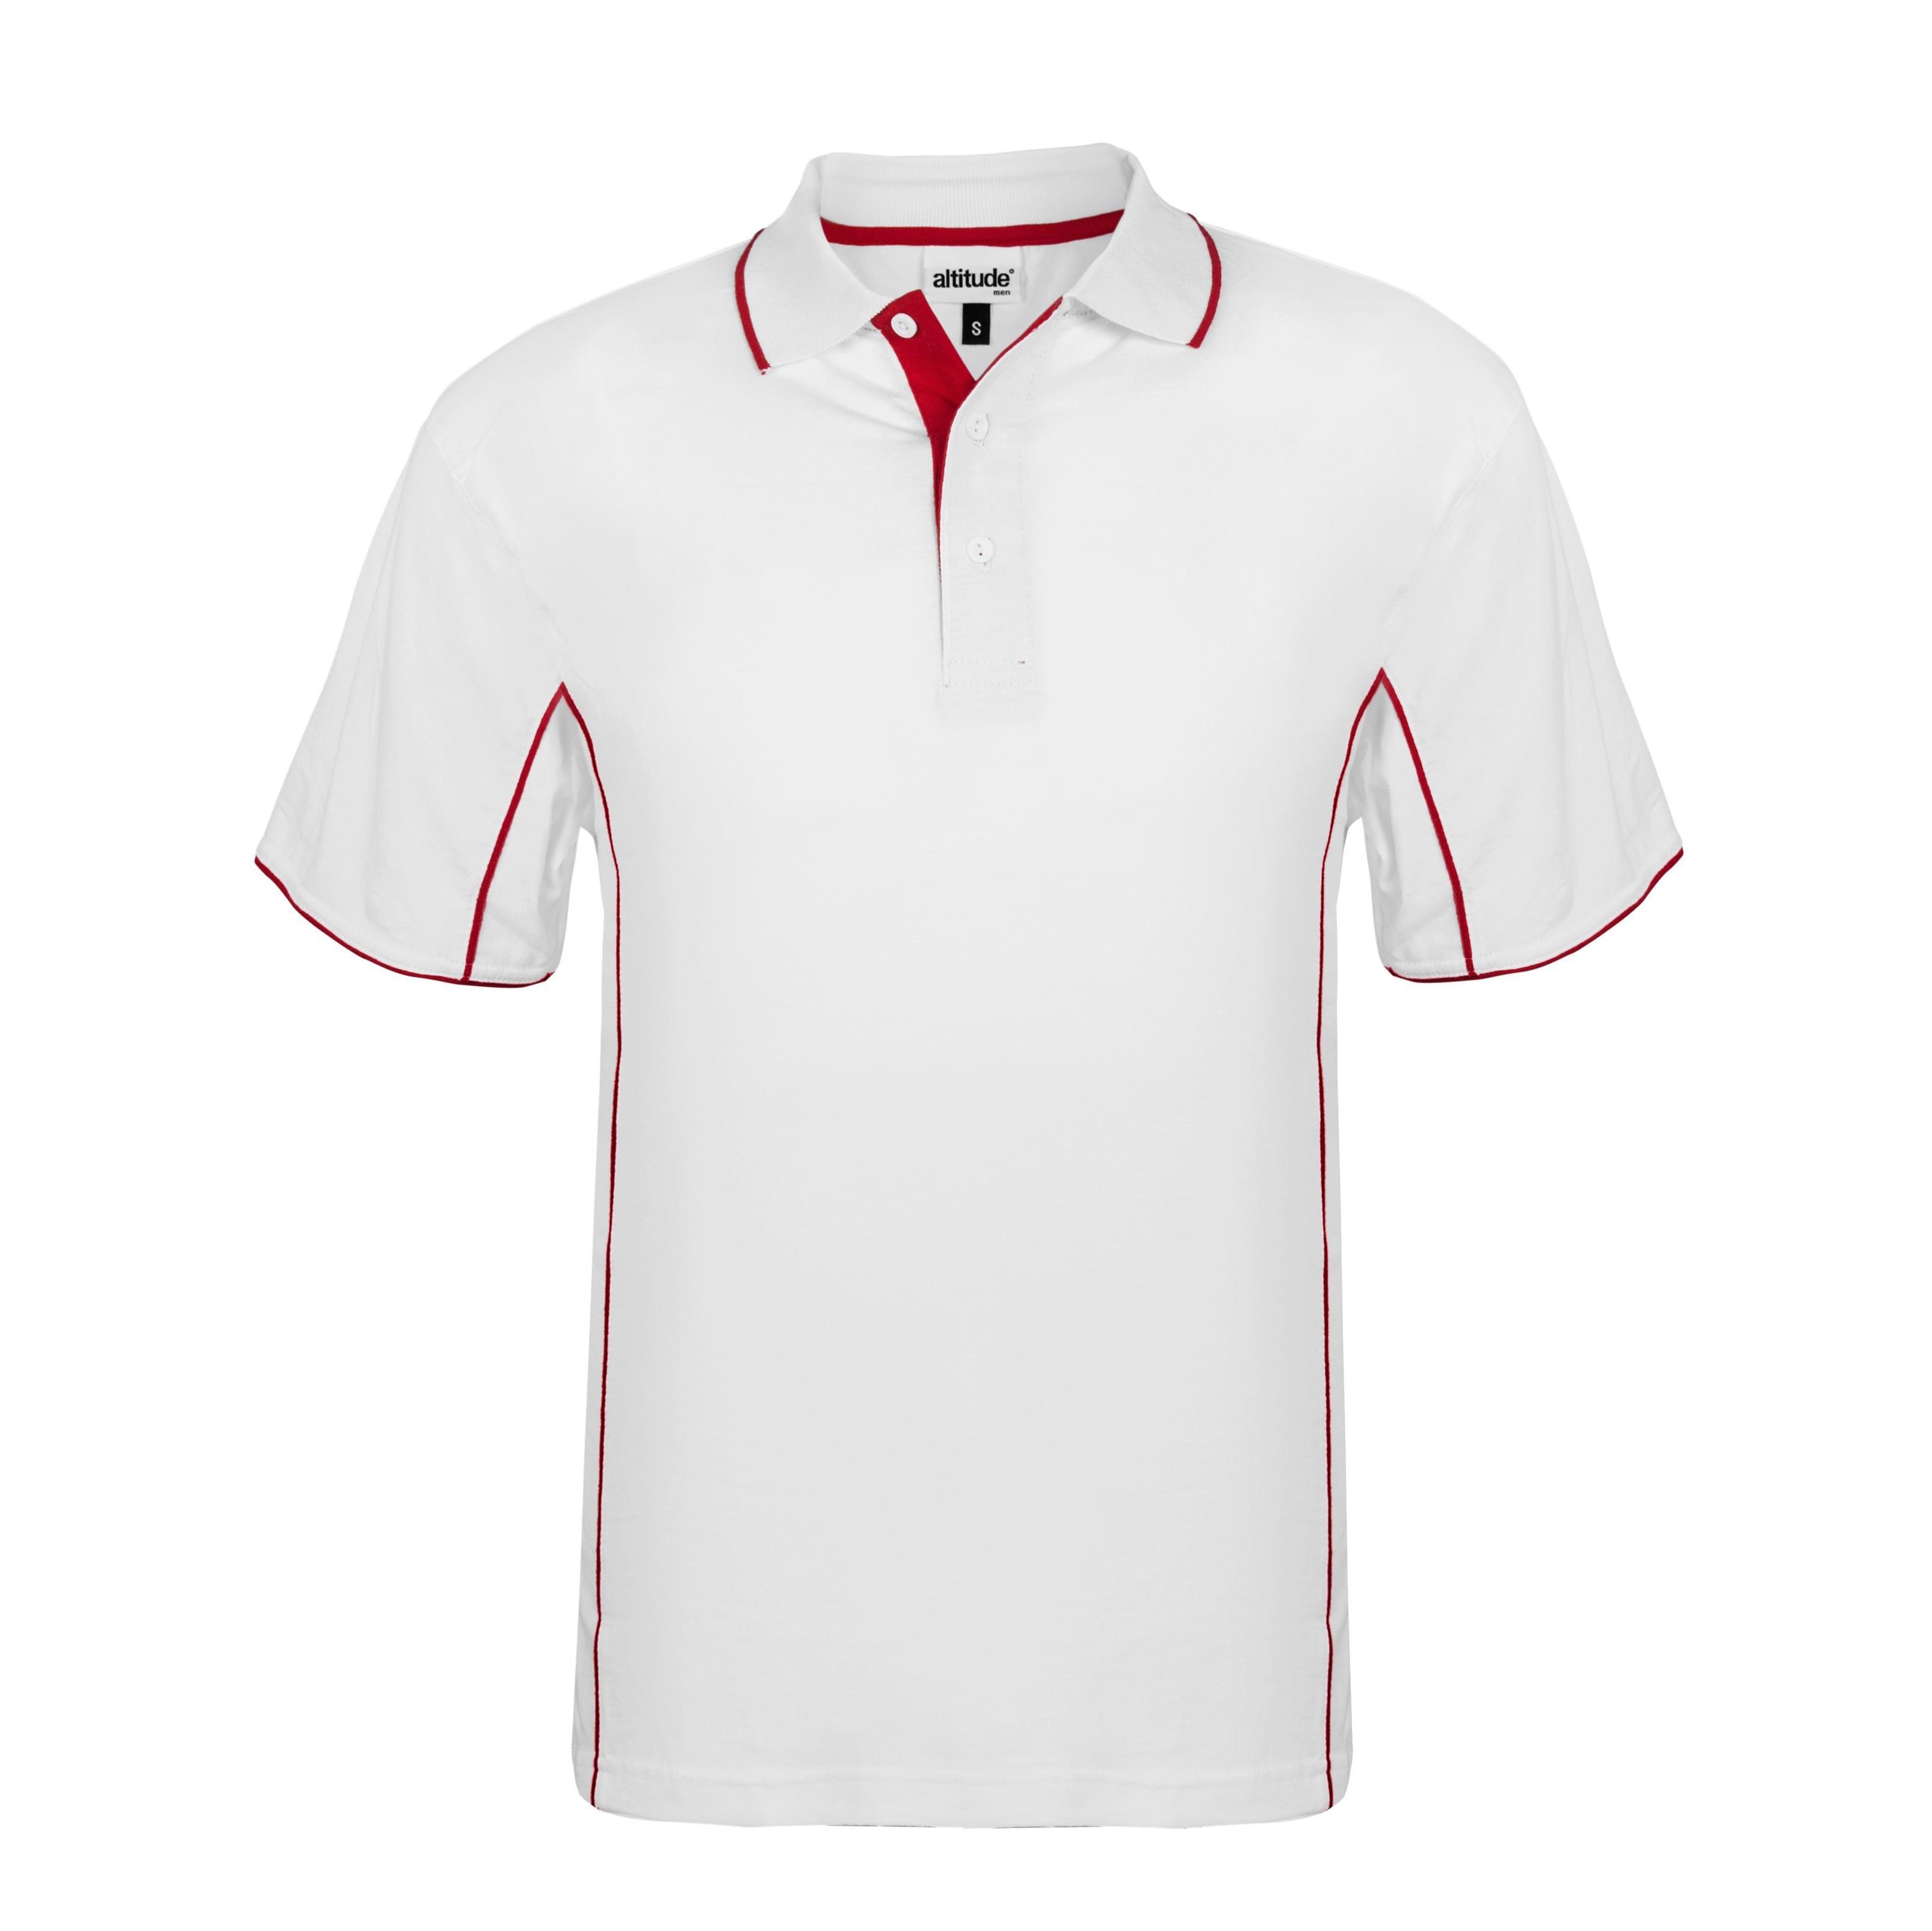 Mens Denver Golf Shirt - White And Red Only